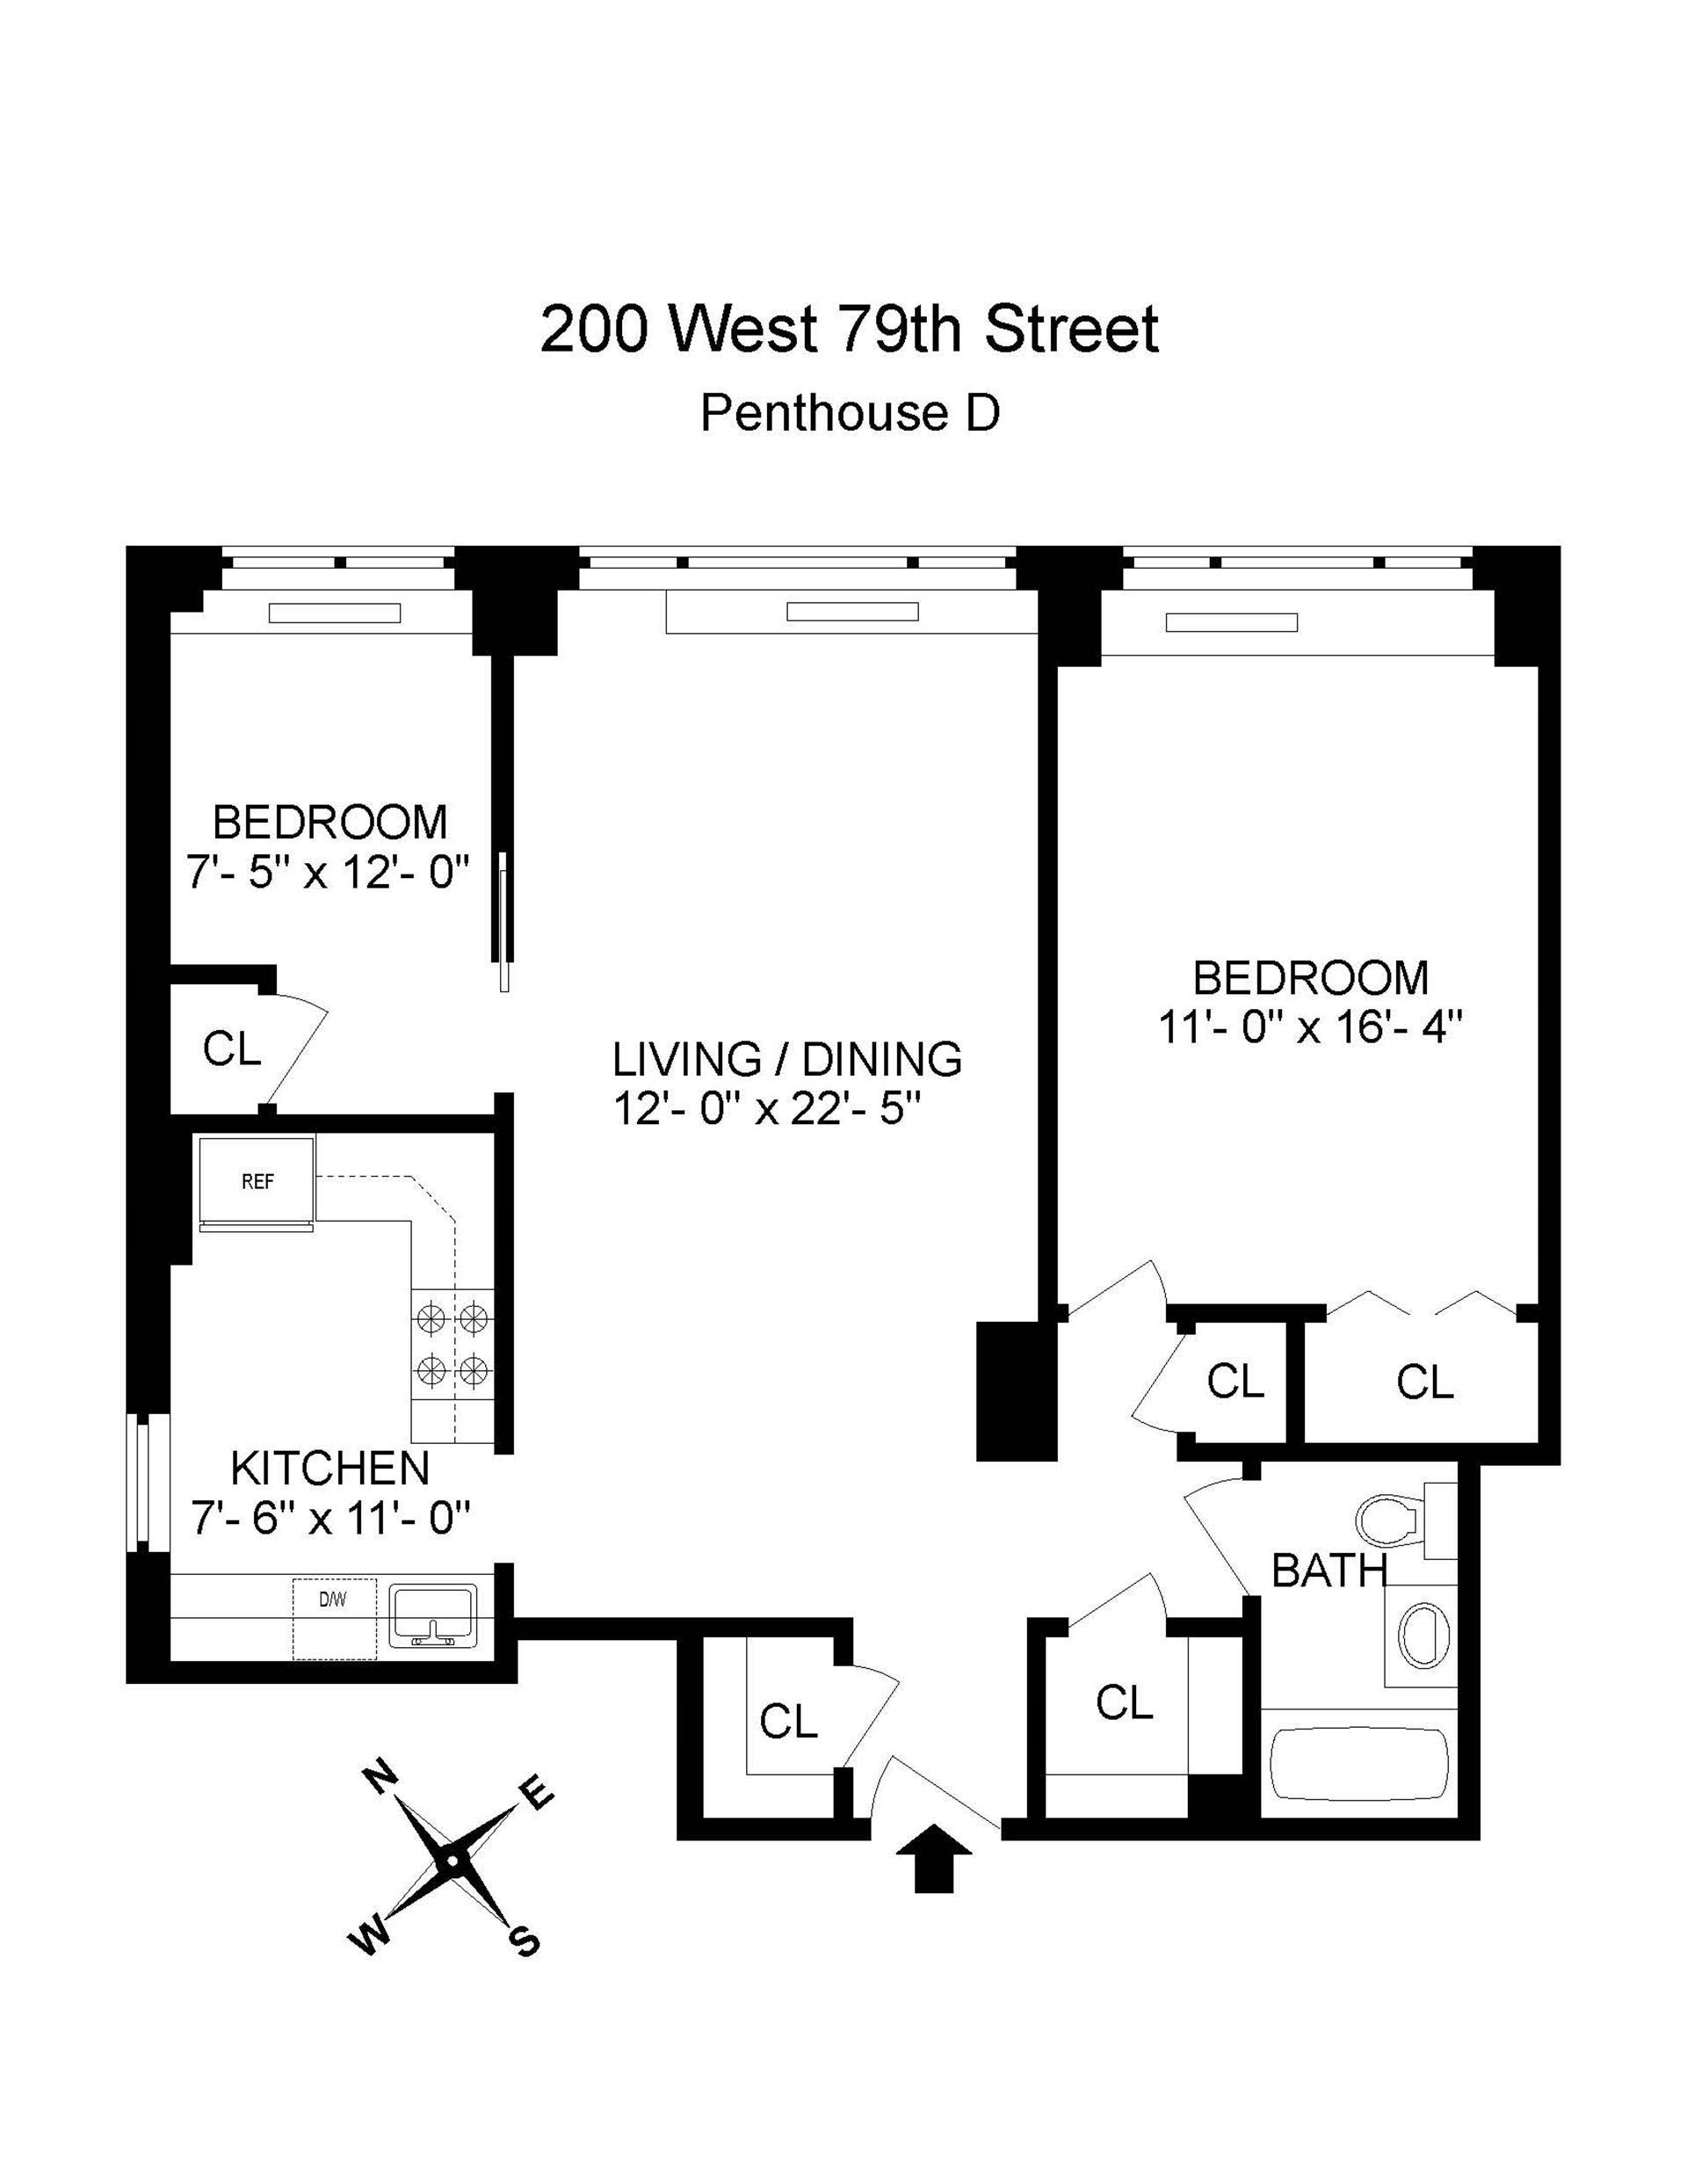 Floor plan of Gloucester, 200 West 79th St, PHD - Upper West Side, New York